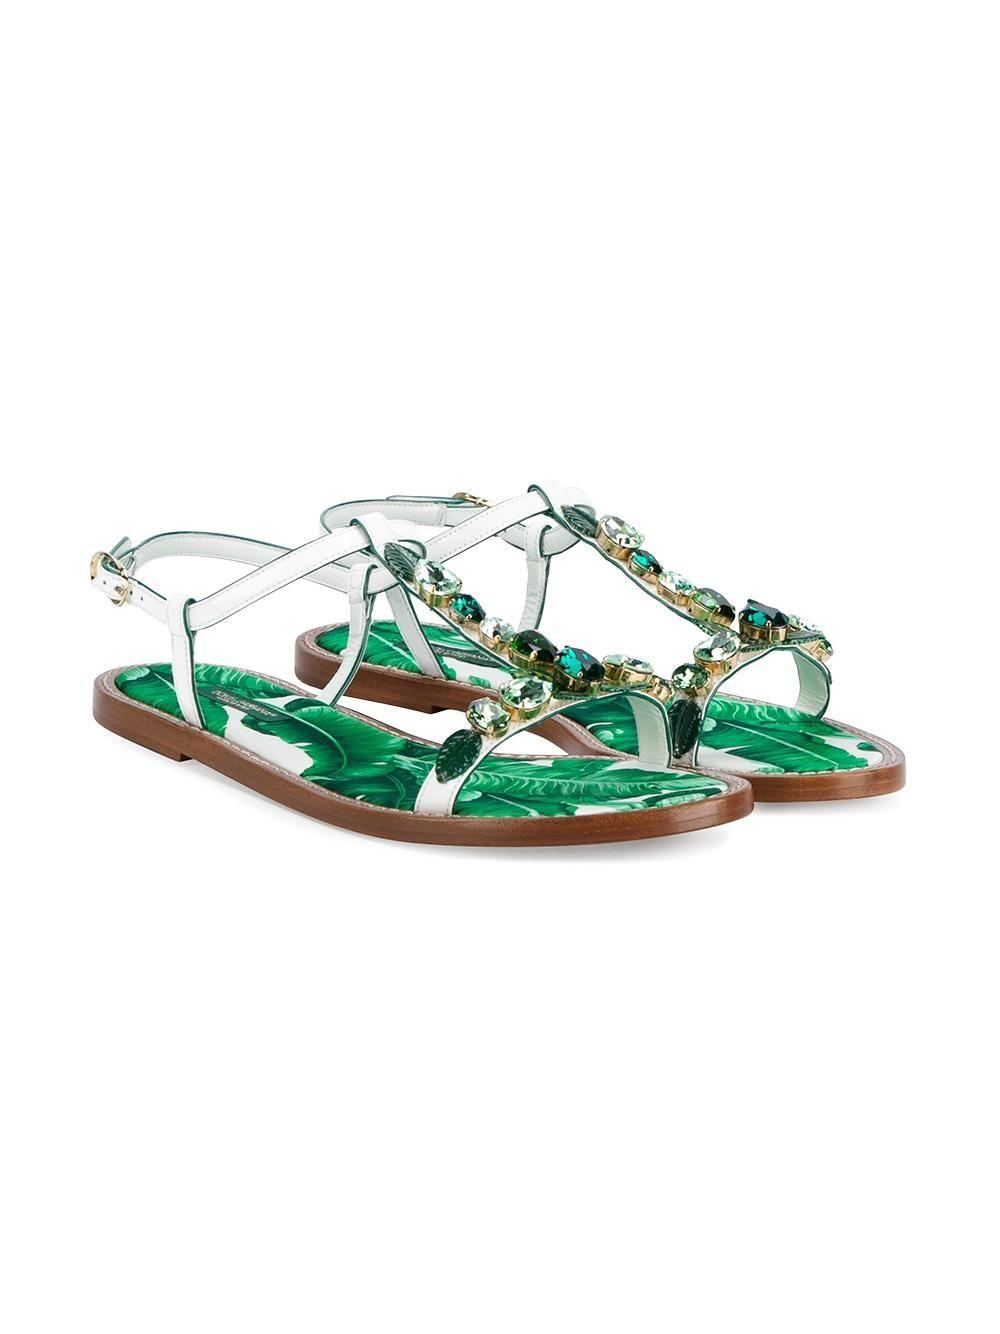 Dolce Et Feuille De Bananier Gabbana Sandales Embelli - Blanc BtFqjpSxh